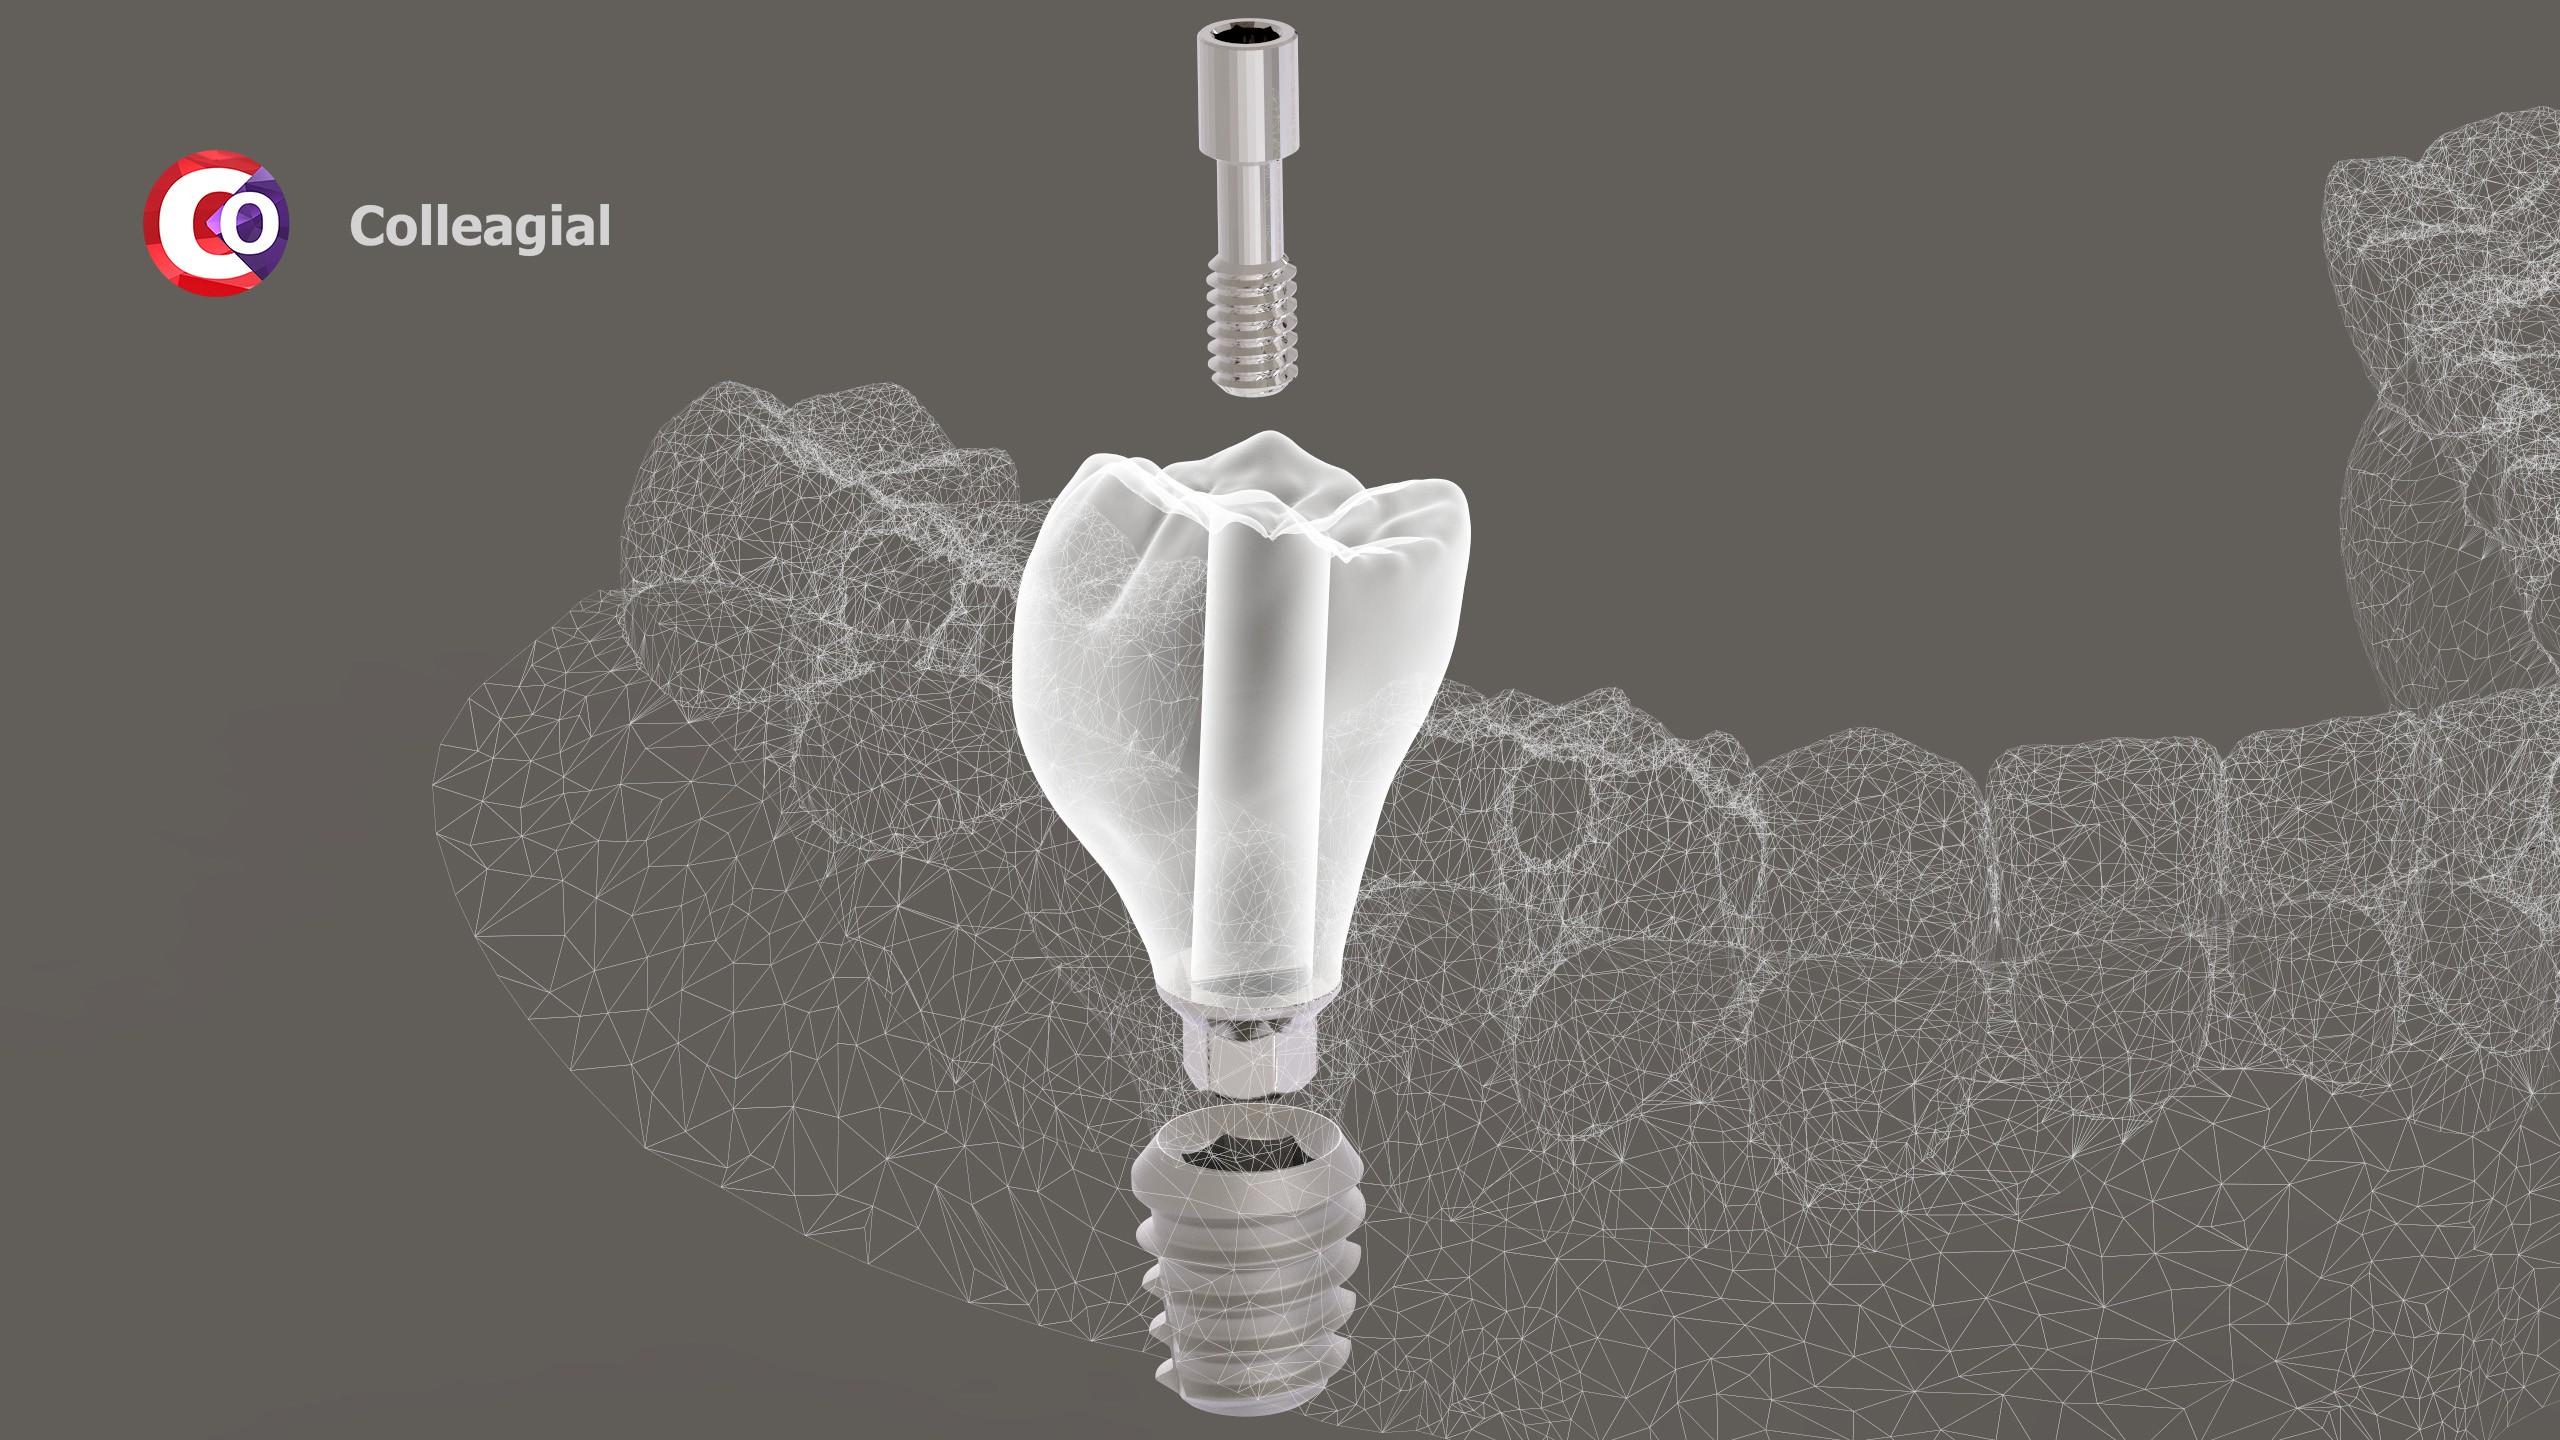 vintovaya-fiksaciya-koronok-na-implanty-04